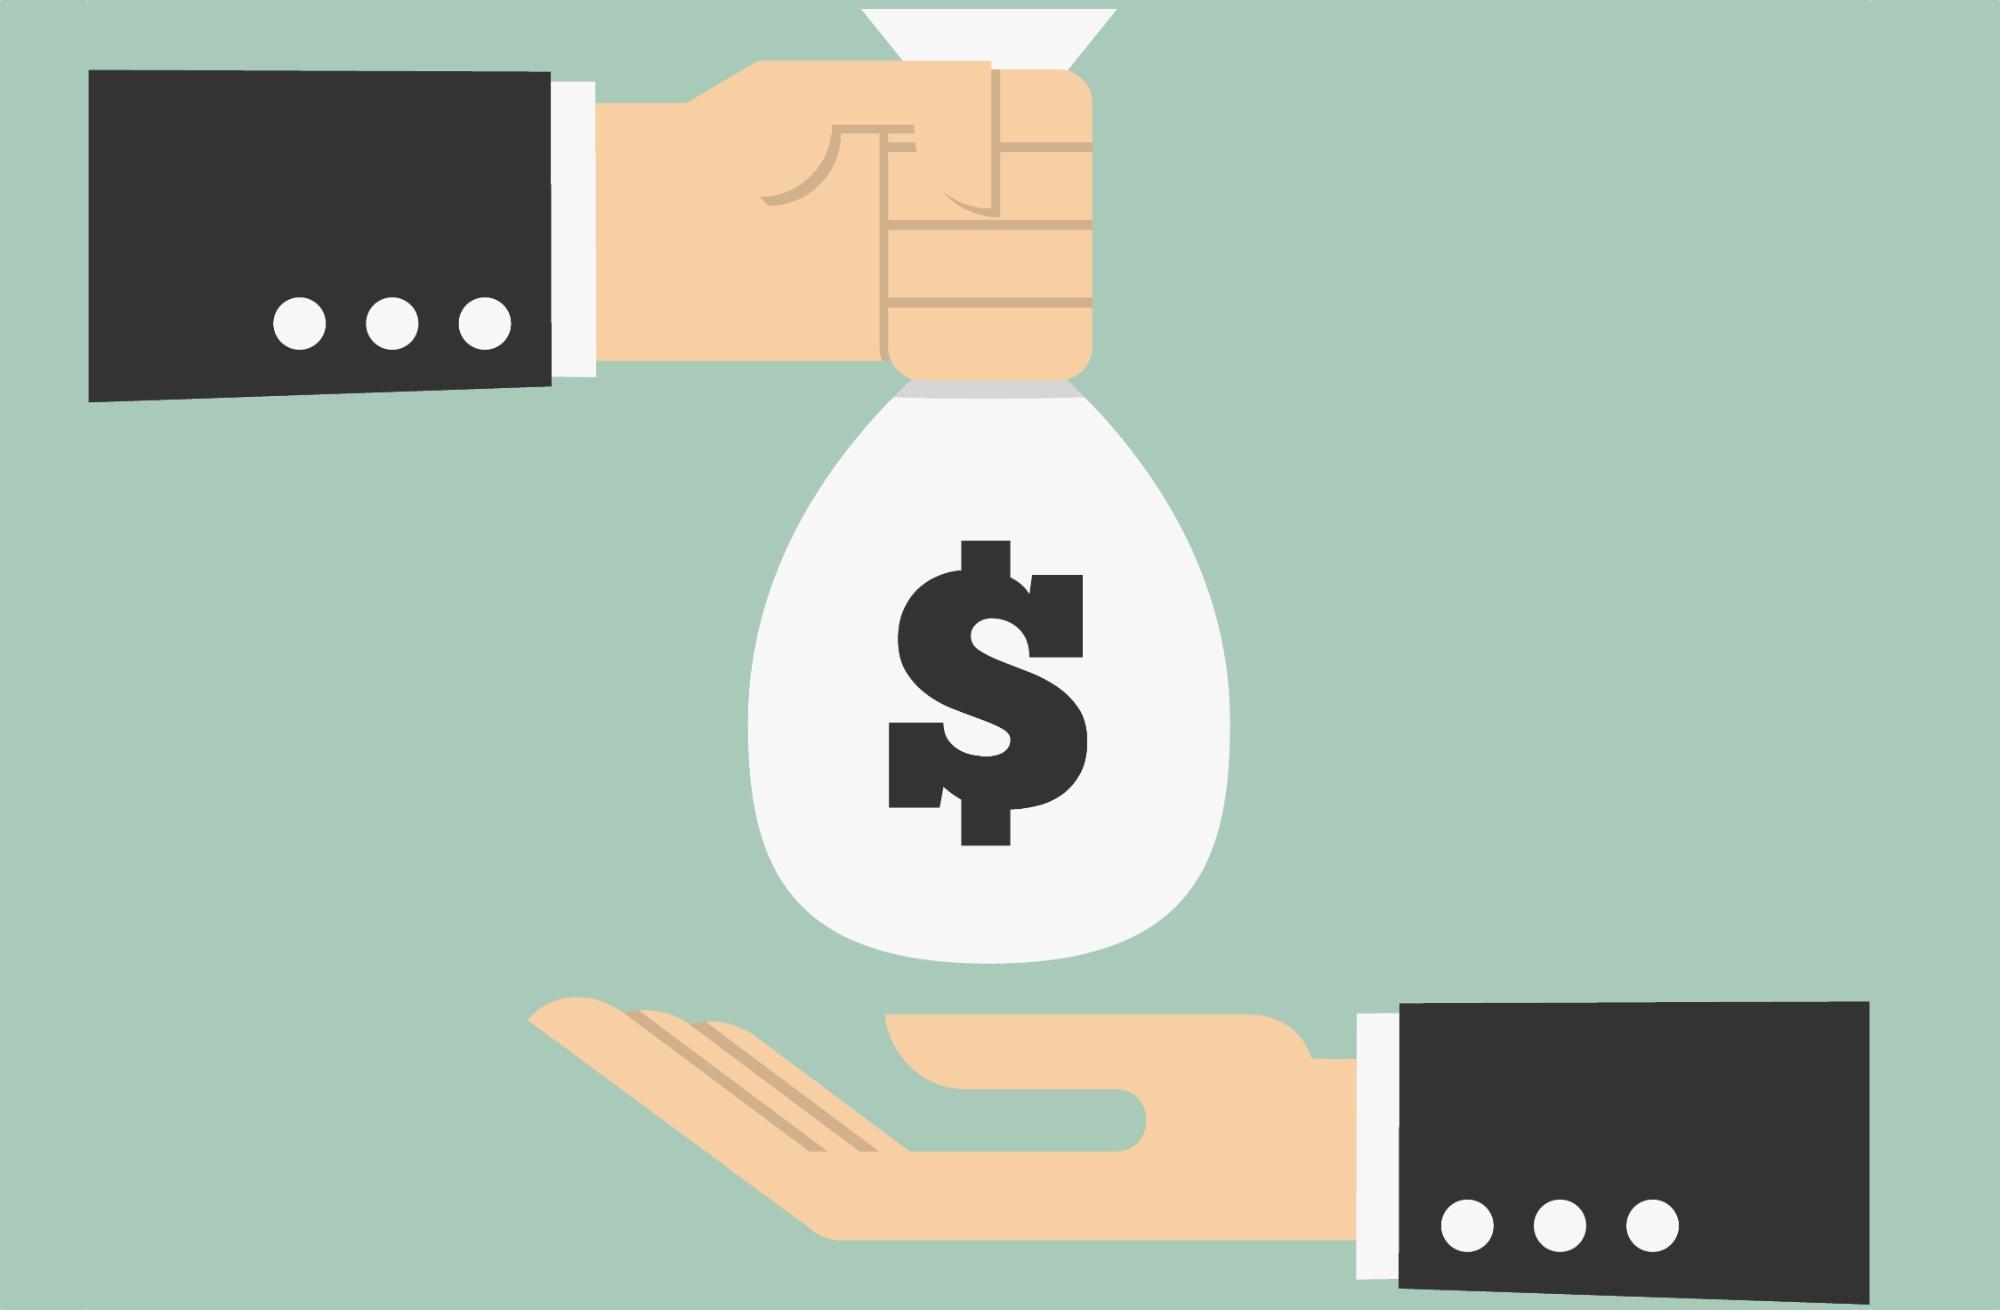 Step-by-Step guide of Negotiating Salaries.